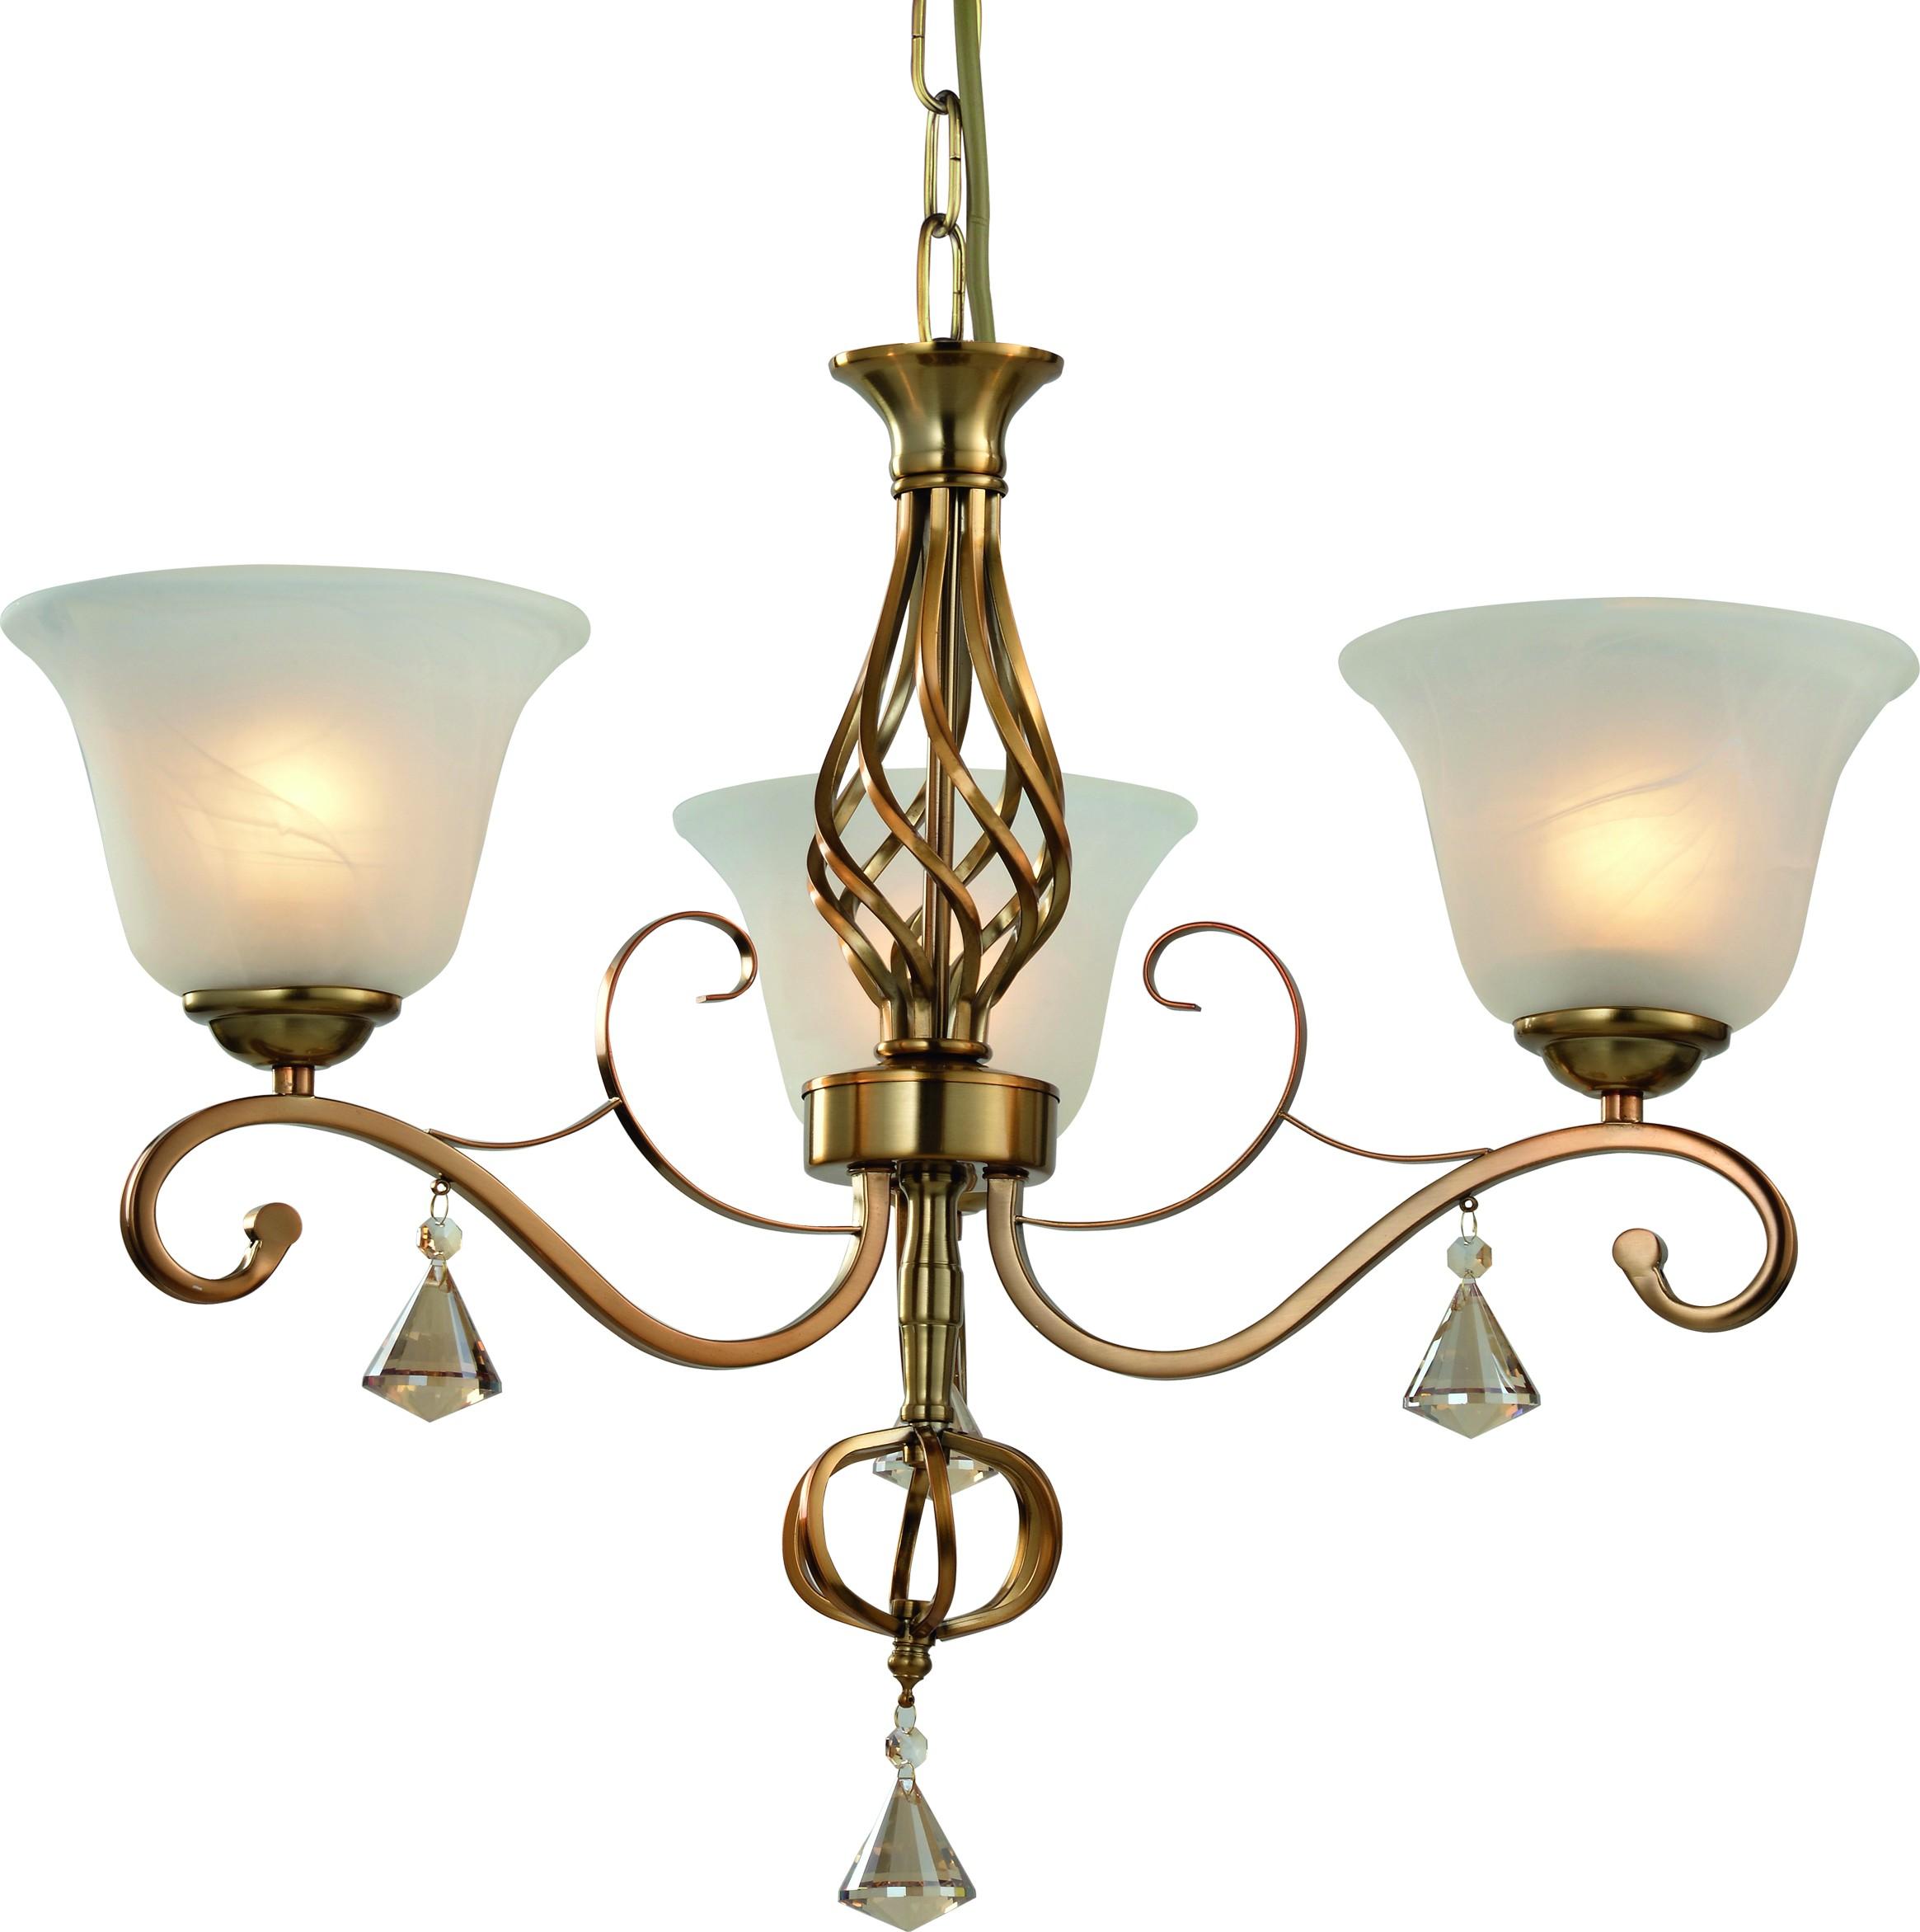 Люстра Arte lamp A8391lm-3pb